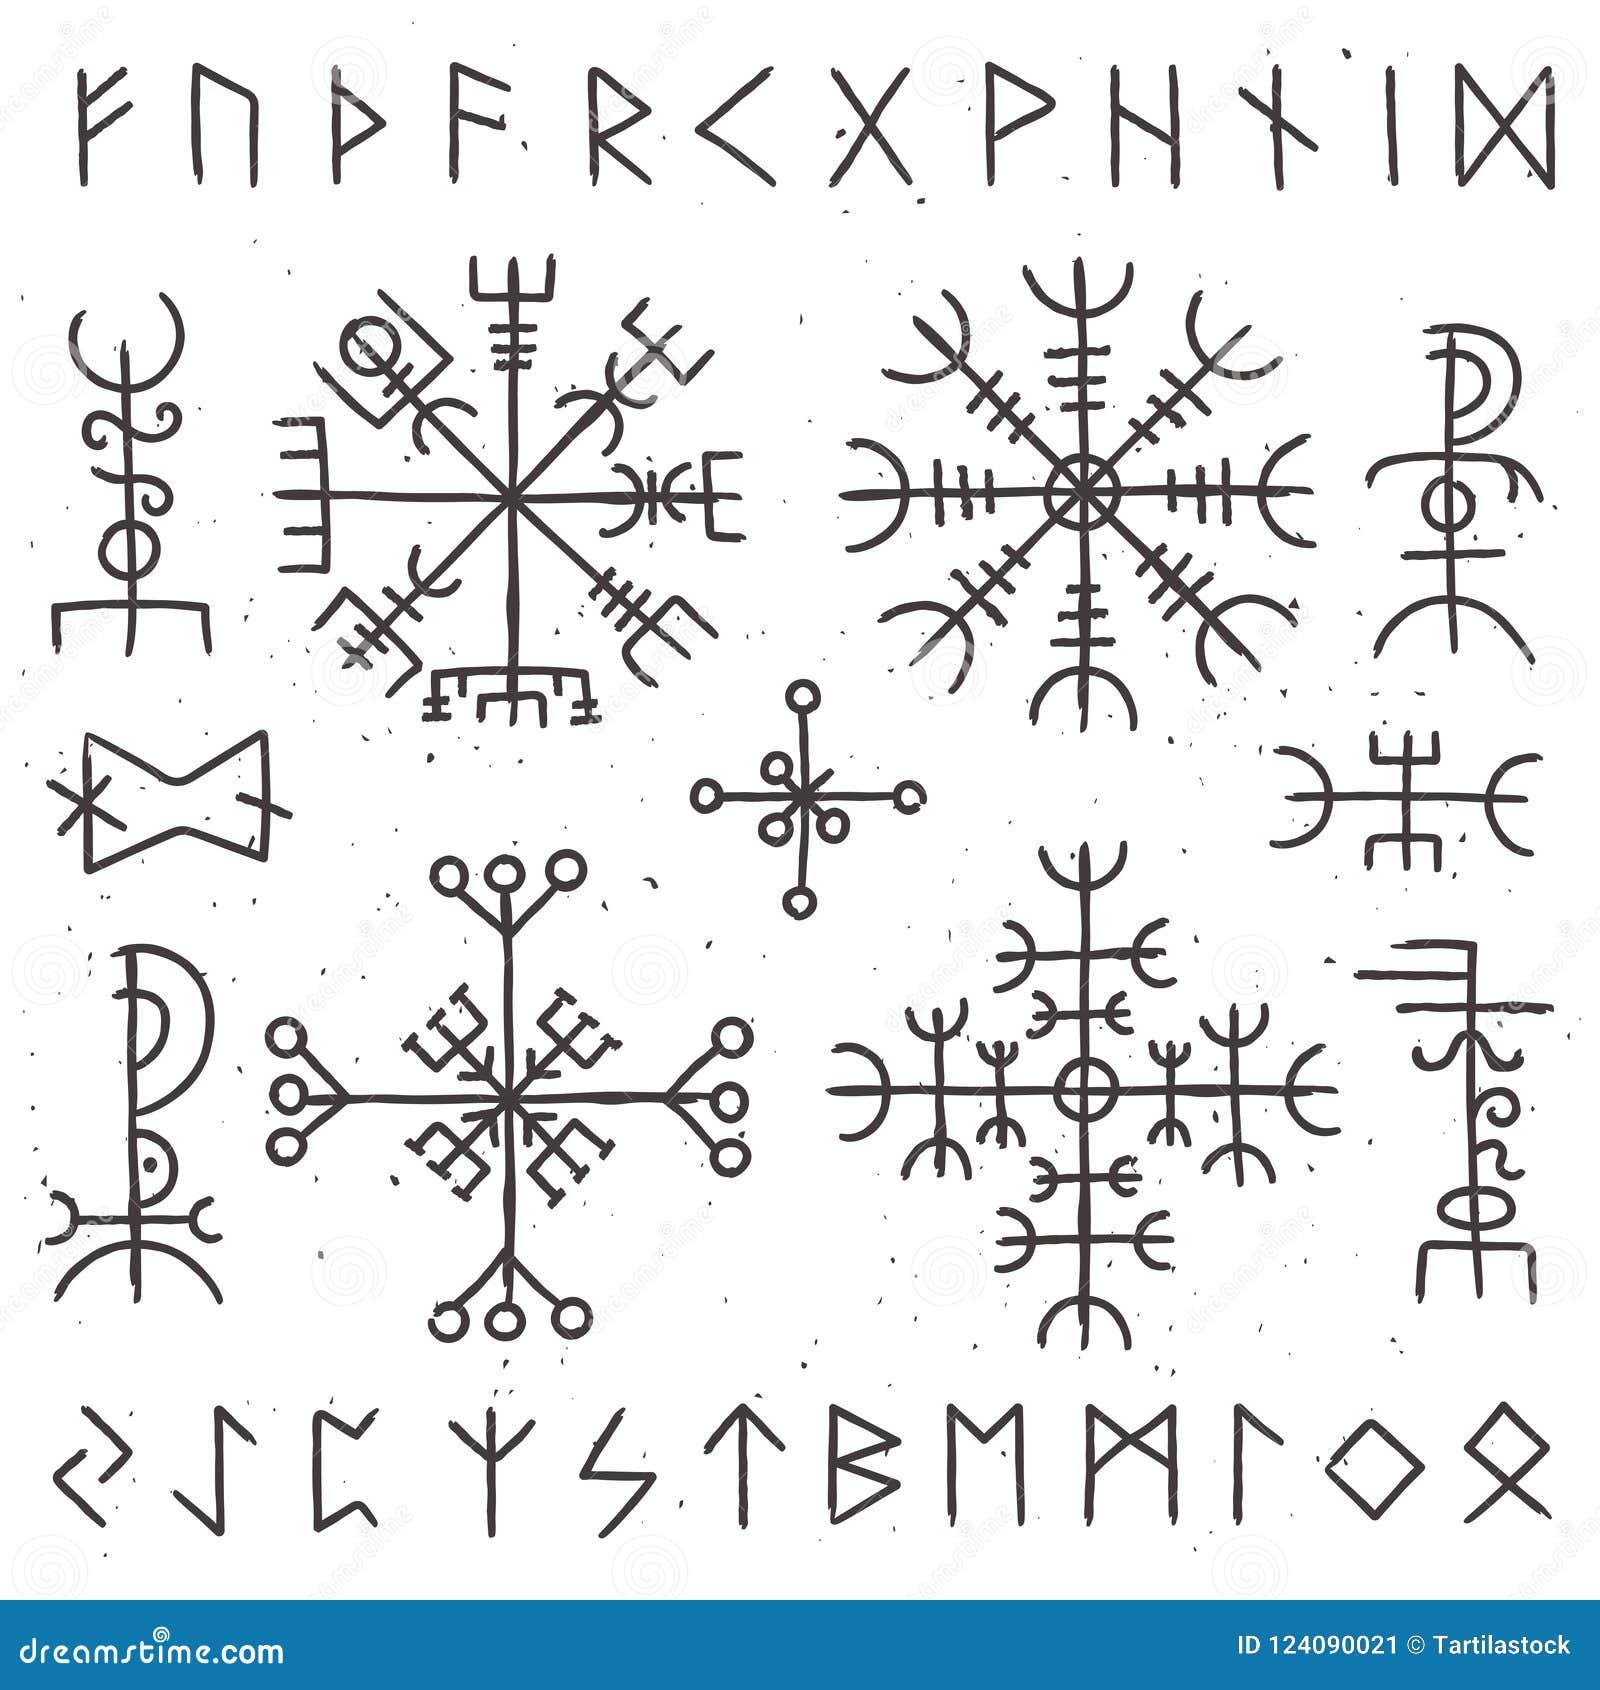 Mystische Wikinger-Runen Alter heidnischer Talisman, Skandinavierrunensymbol Mystizismusehrfurchts-Vektorsymbole